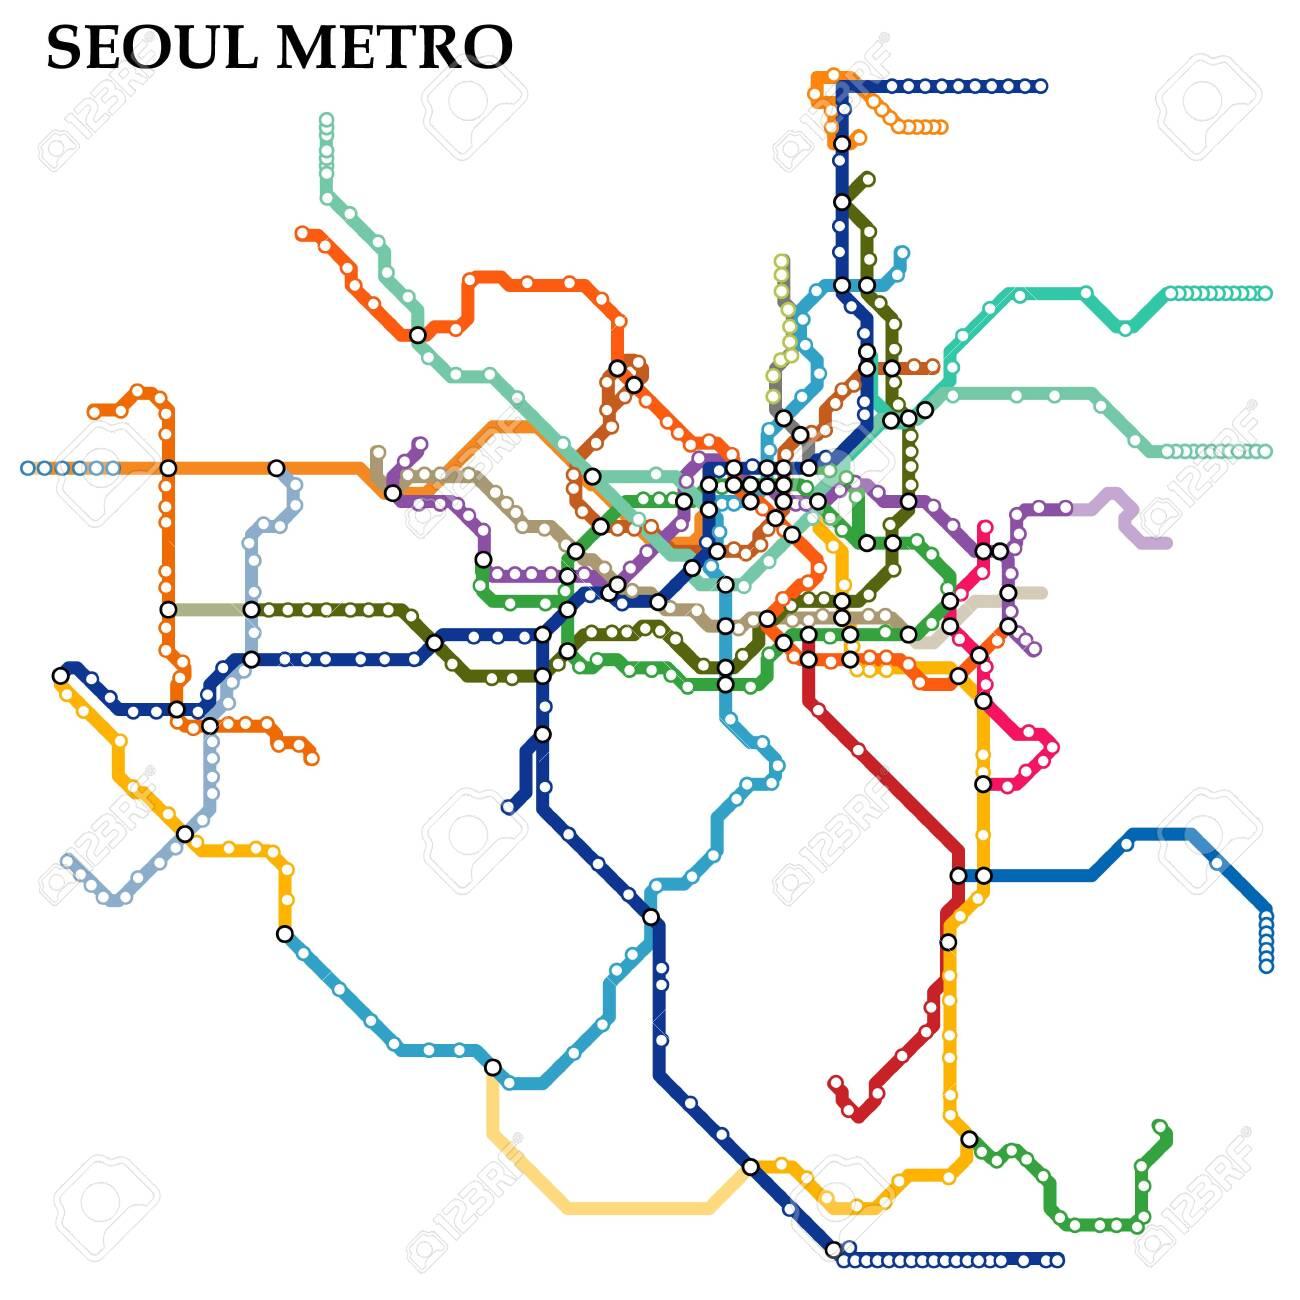 Seoul City Subway Map.Map Of The Seoul Metro Subway Template Of City Transportation